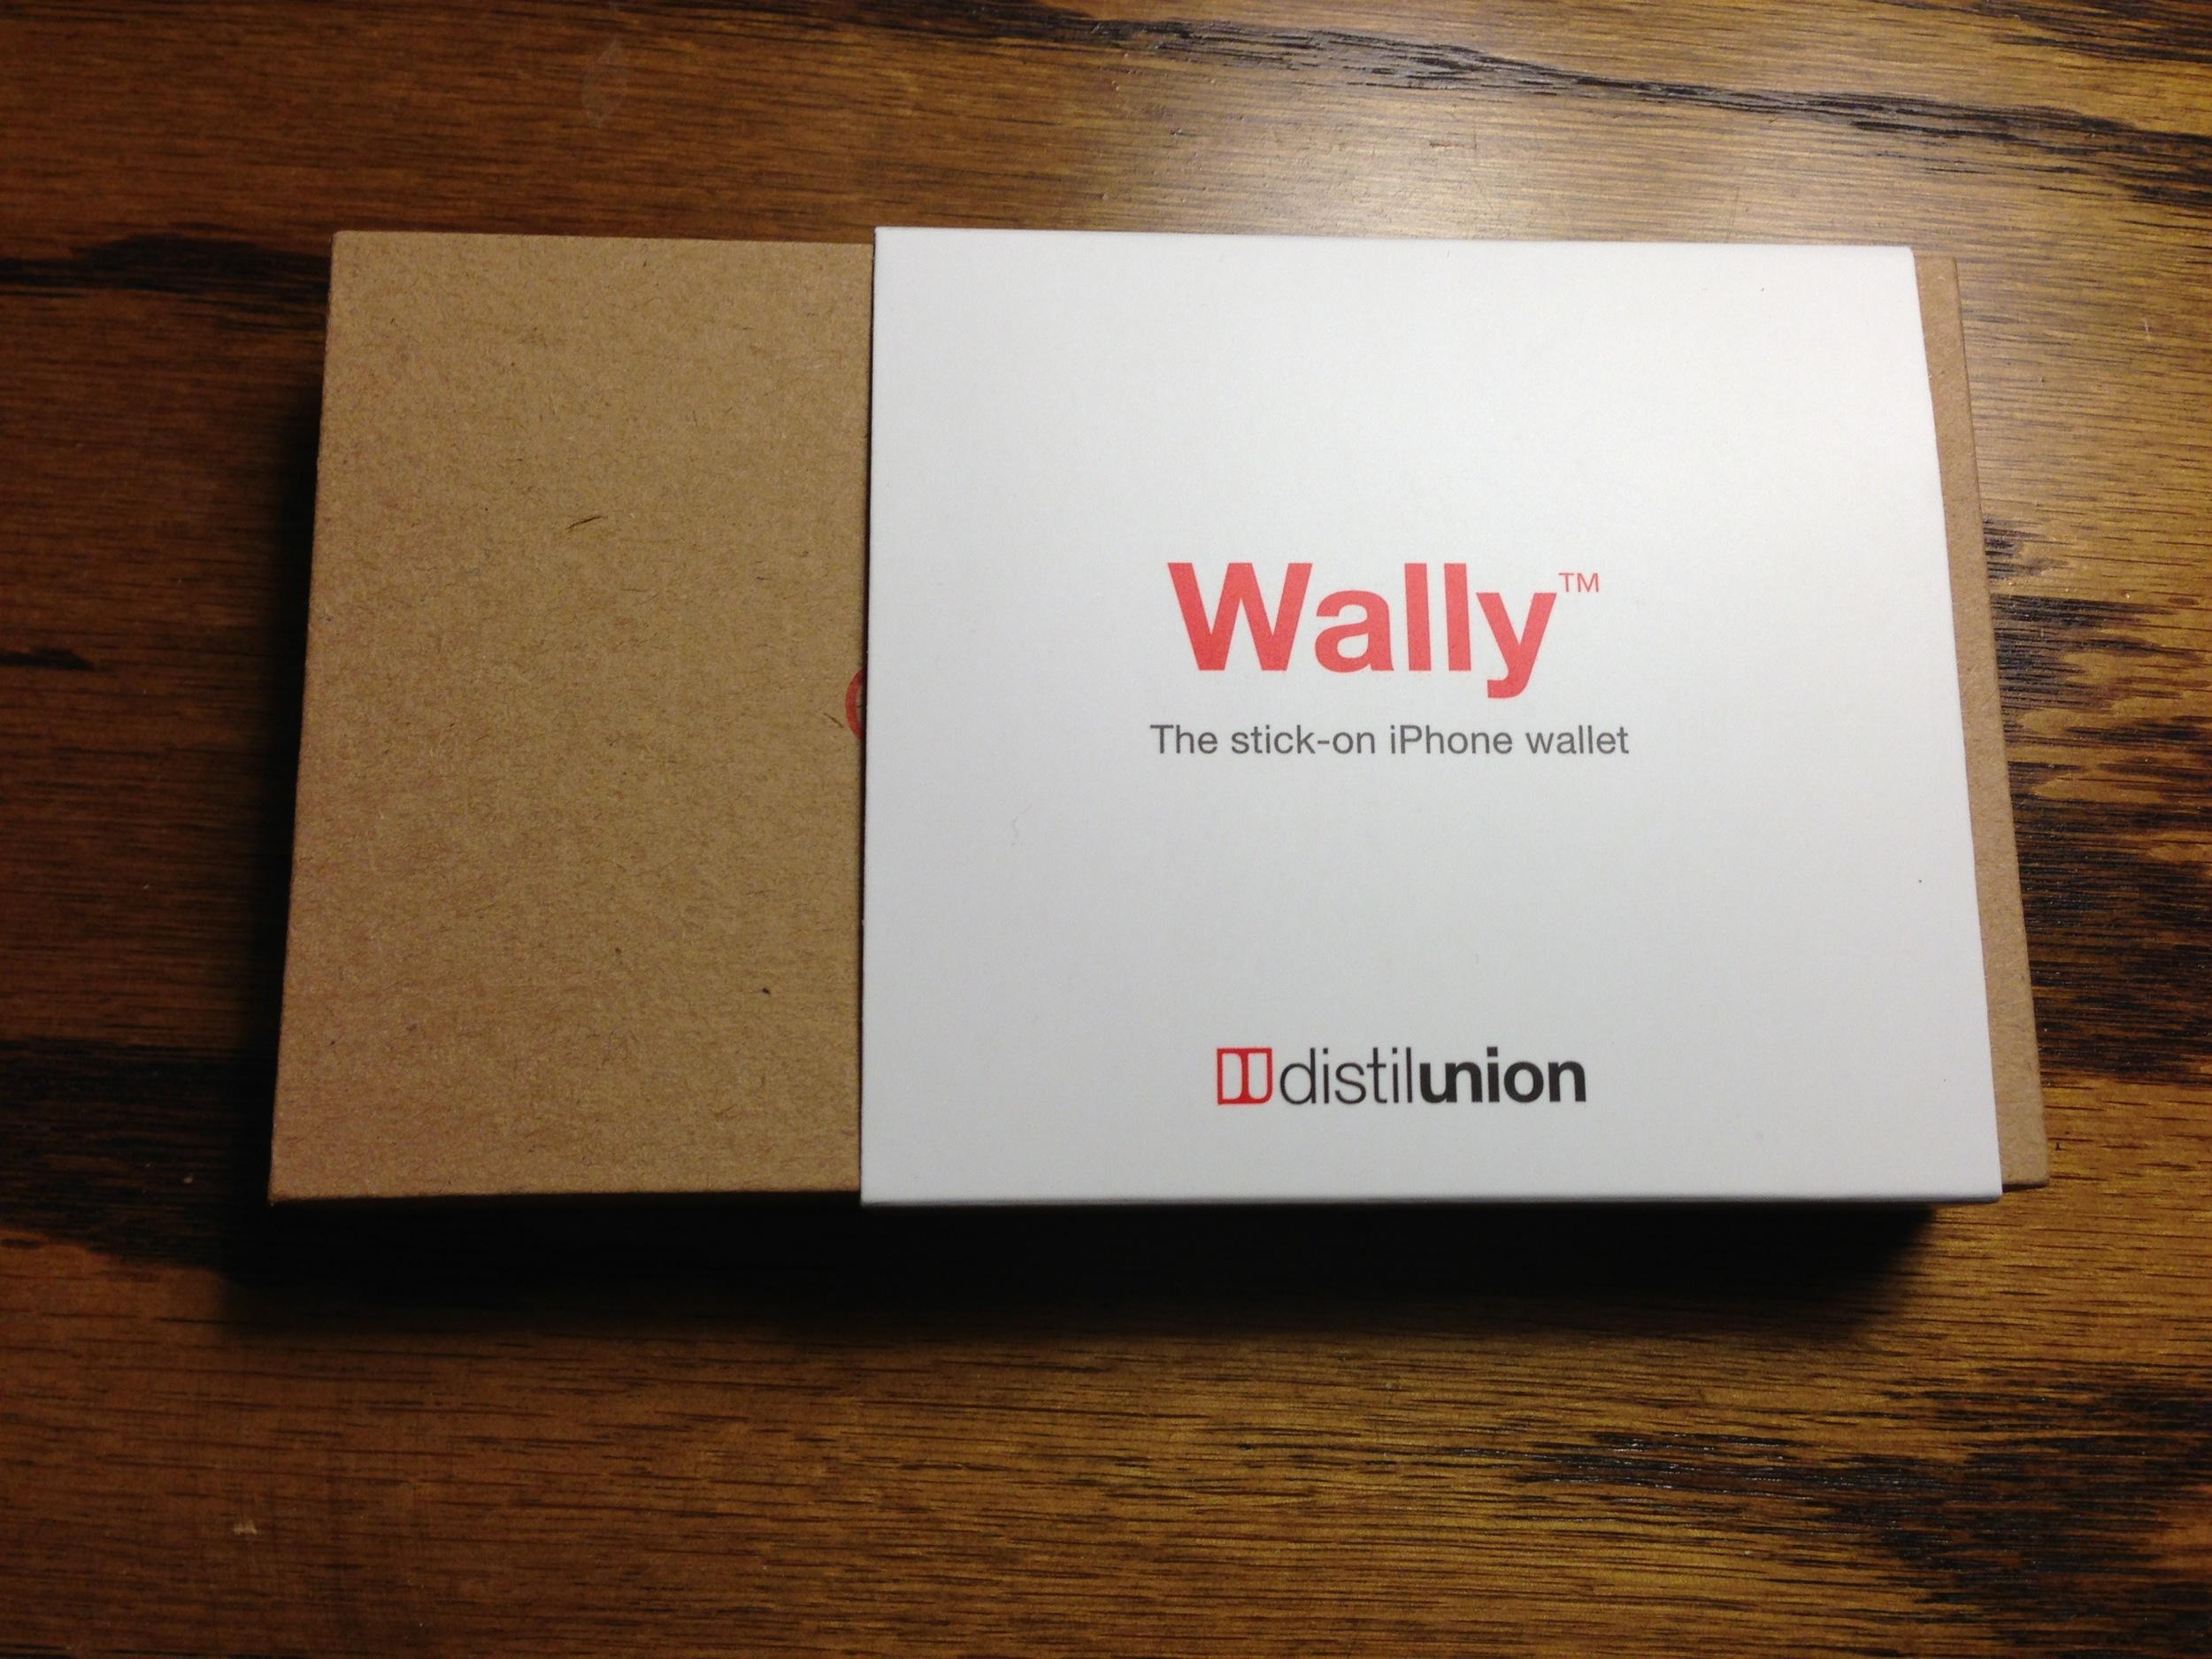 2014-01-07 - Wally_IMG_2101.jpg